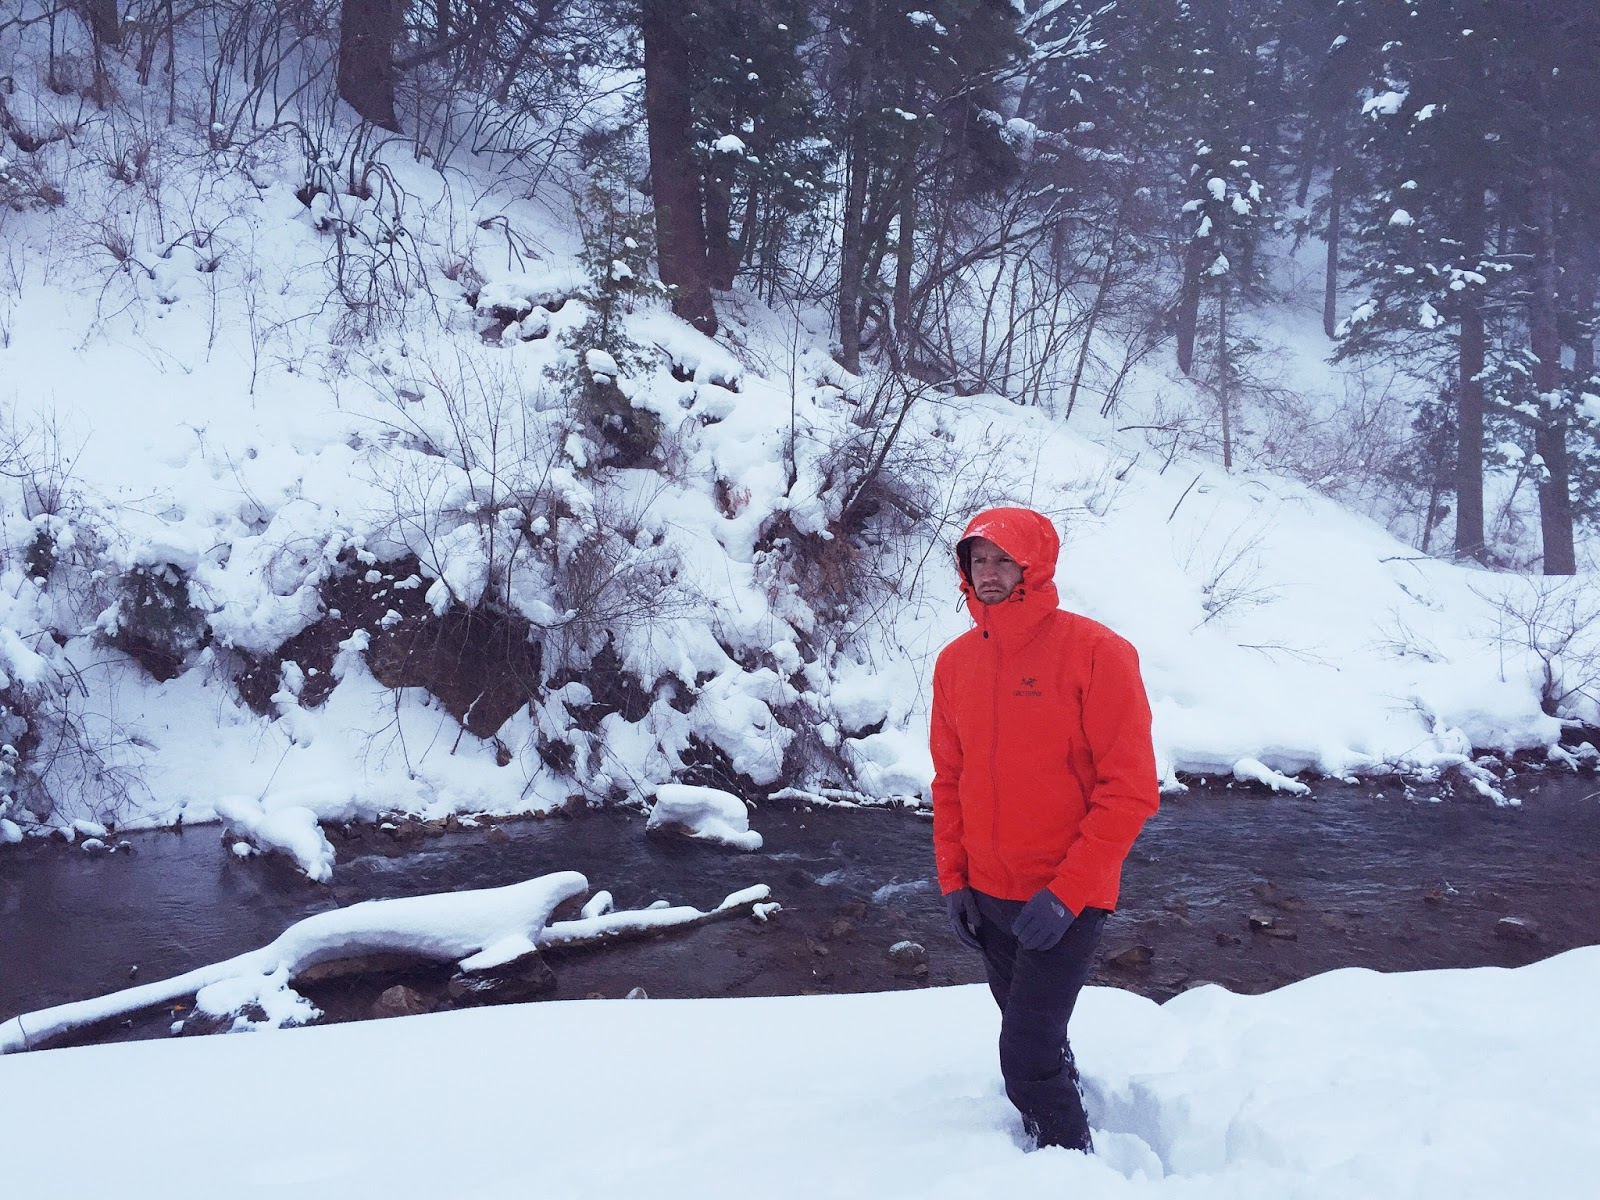 Camping Toilet Gamma : Hiking u2013 backcountry exposure